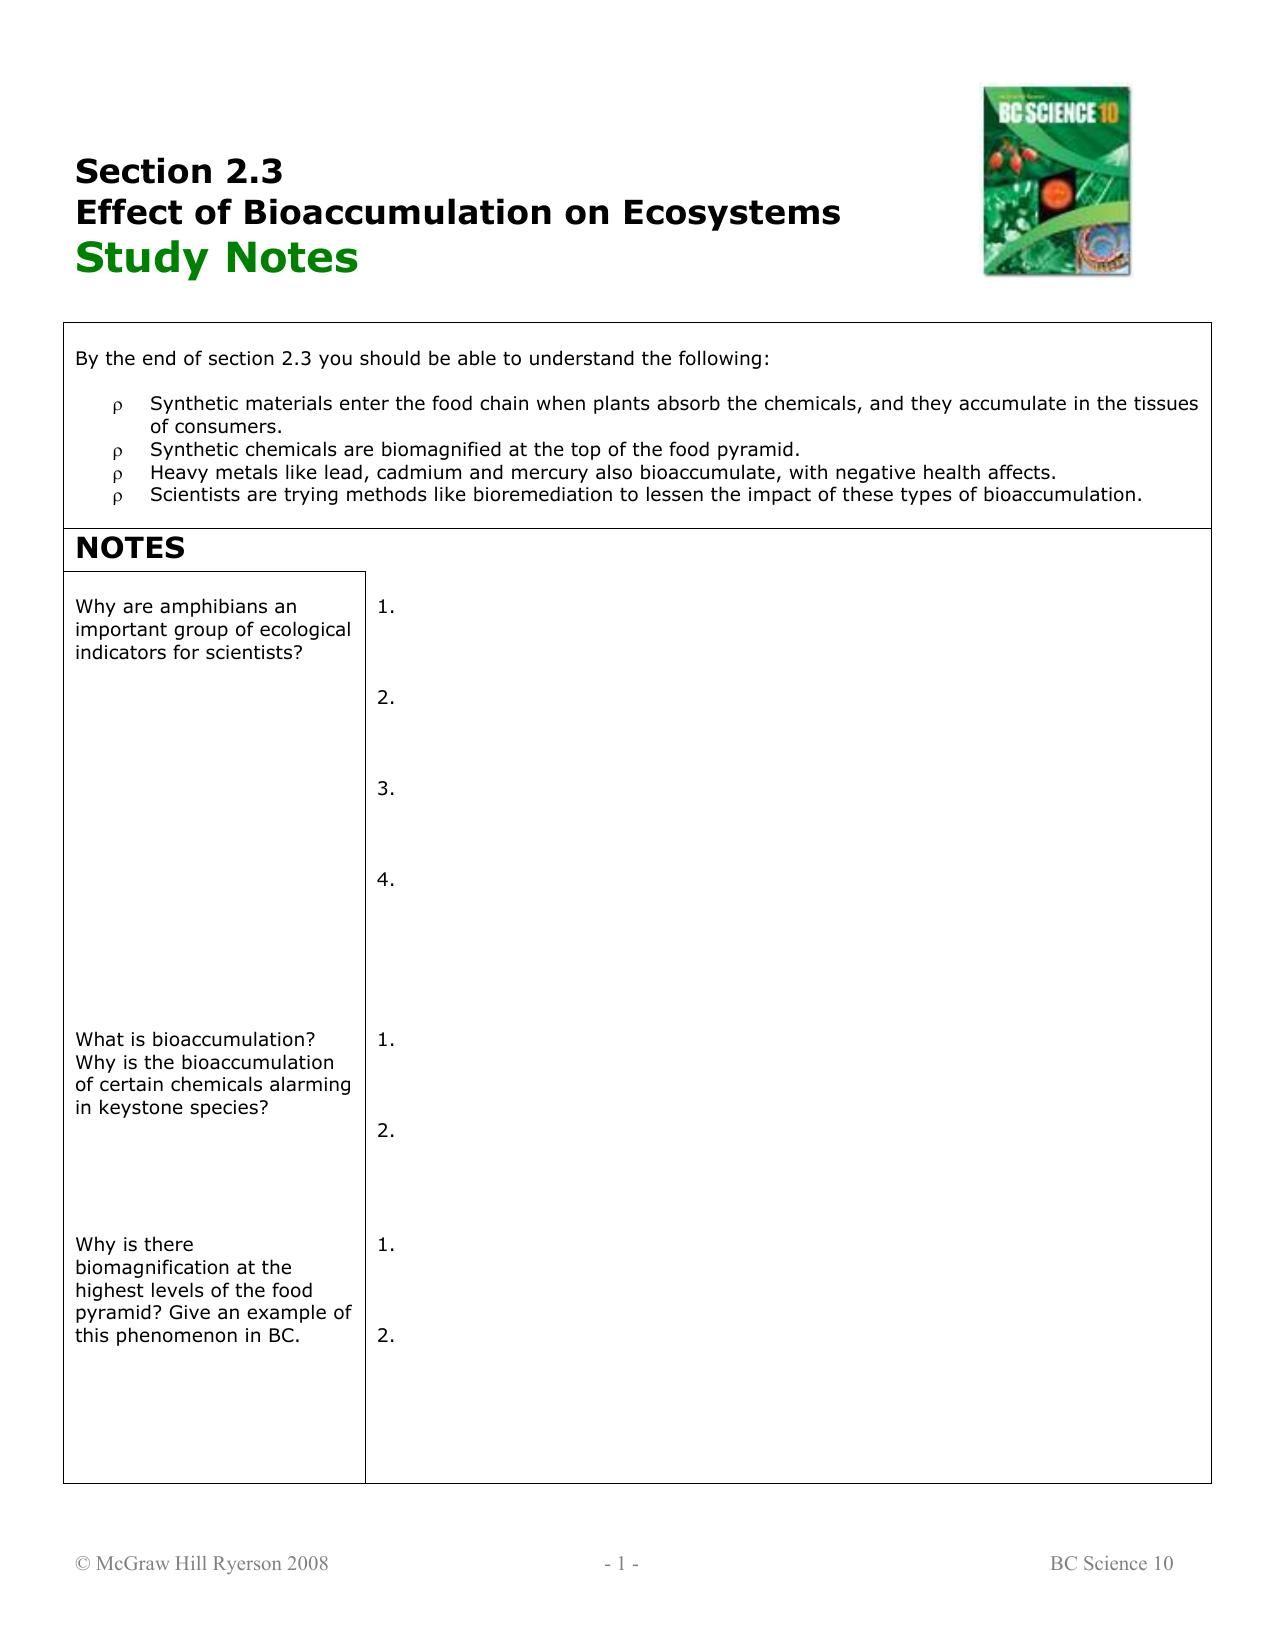 Workbooks bc science 10 workbook : 2.3 Study Notes